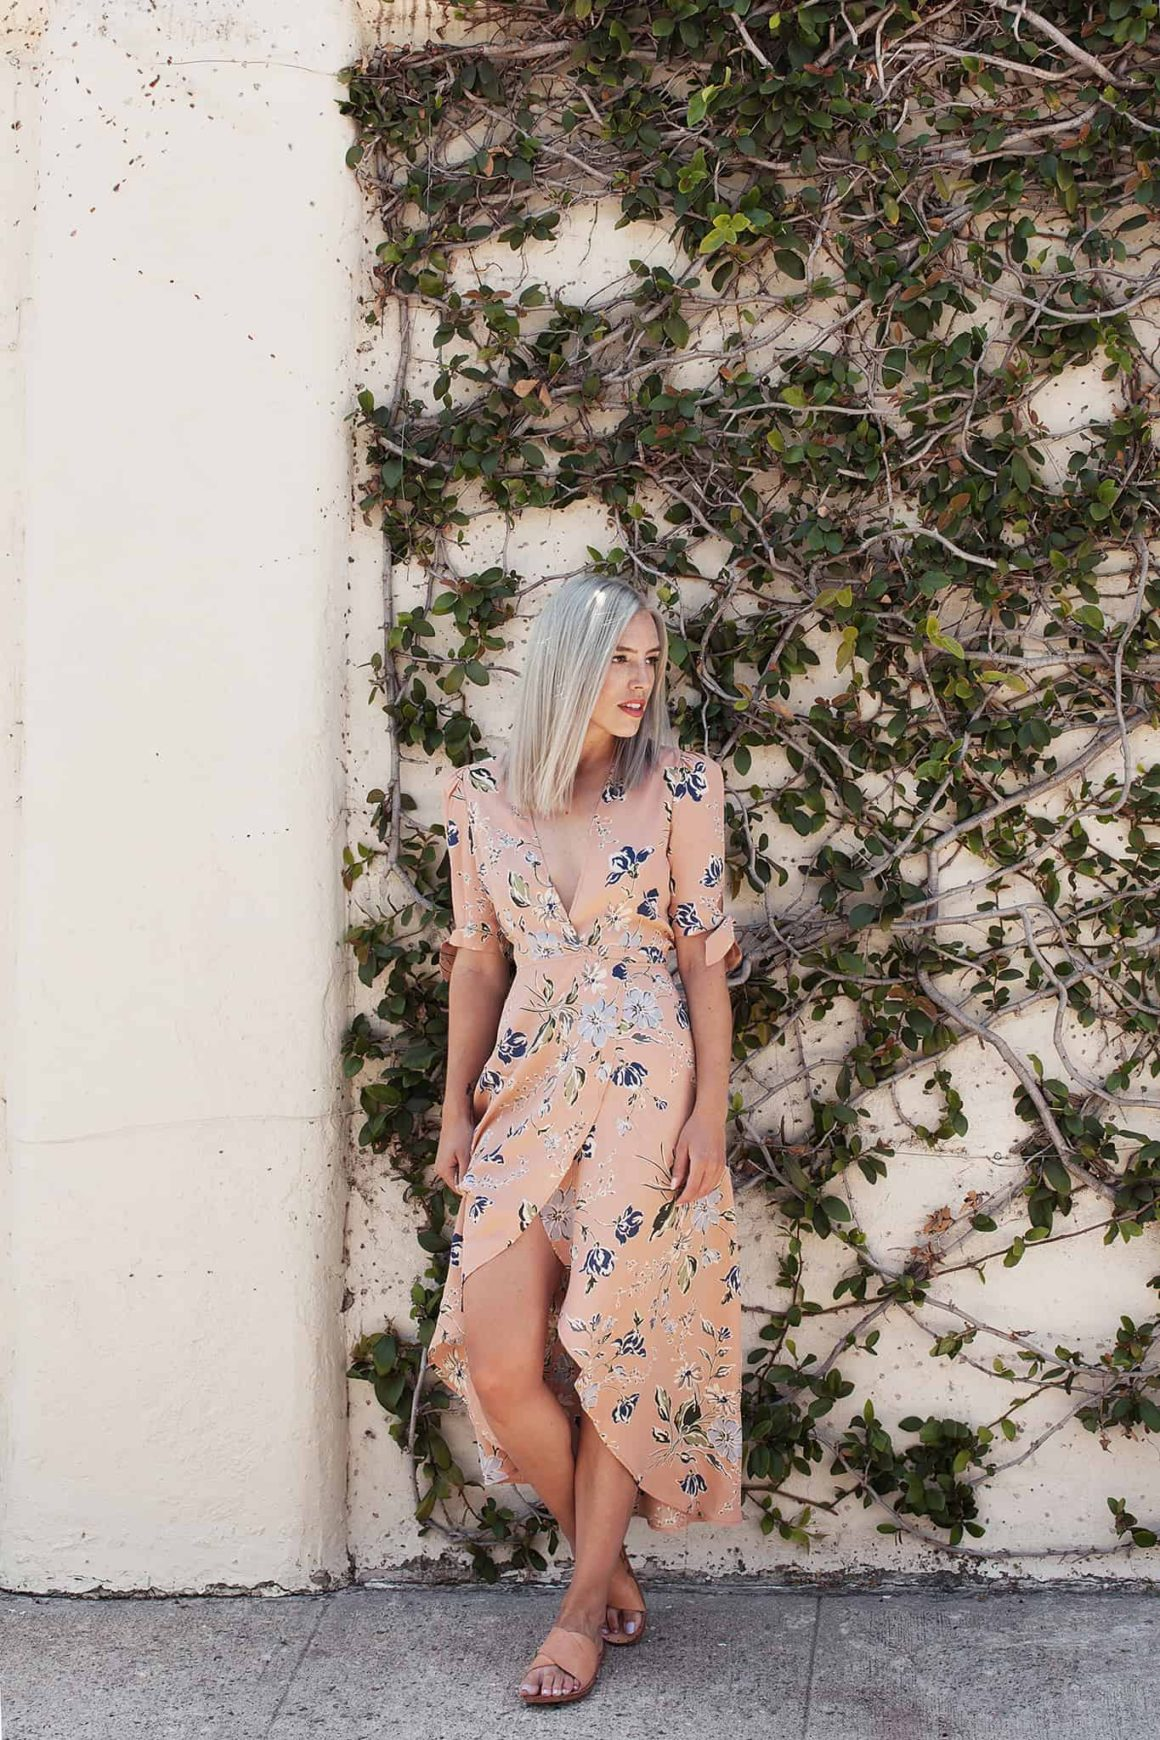 FLORAL PRINT WRAP DRESS + FLATS